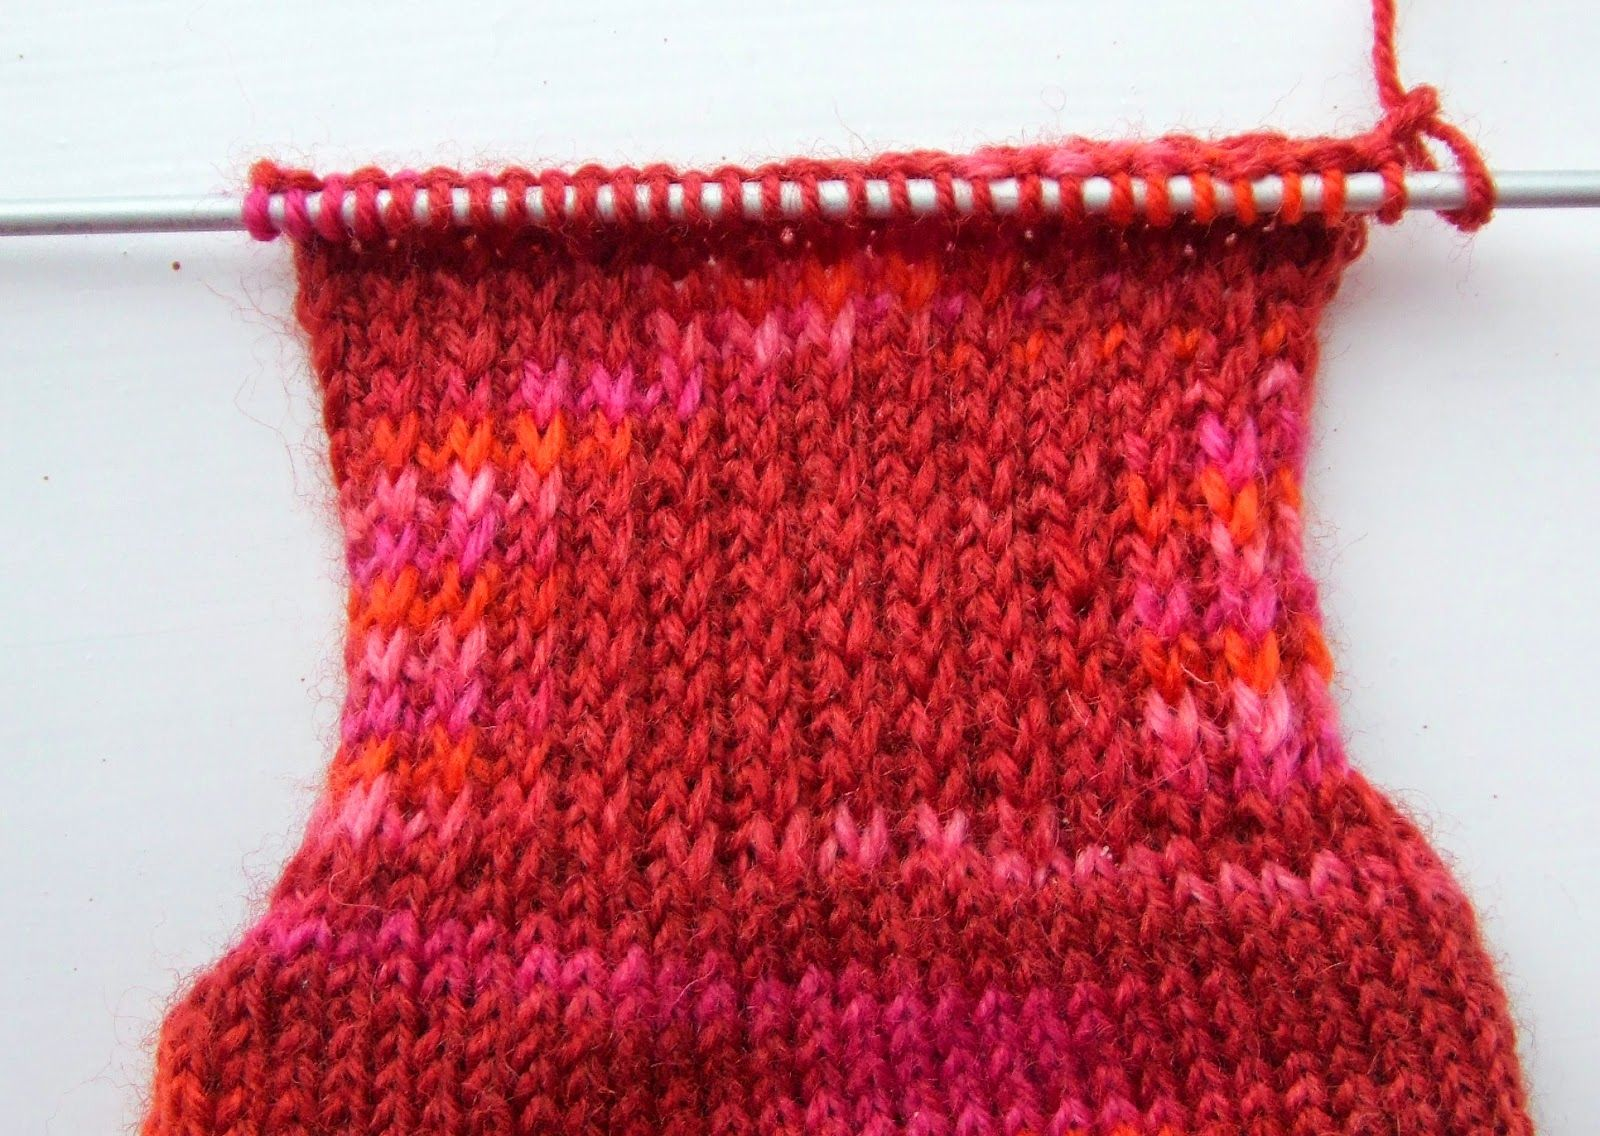 Winwick mum basic sock pattern and tutorial heel flap for 60 winwick mum basic sock pattern and tutorial heel flap for 60 stitches sock bankloansurffo Gallery